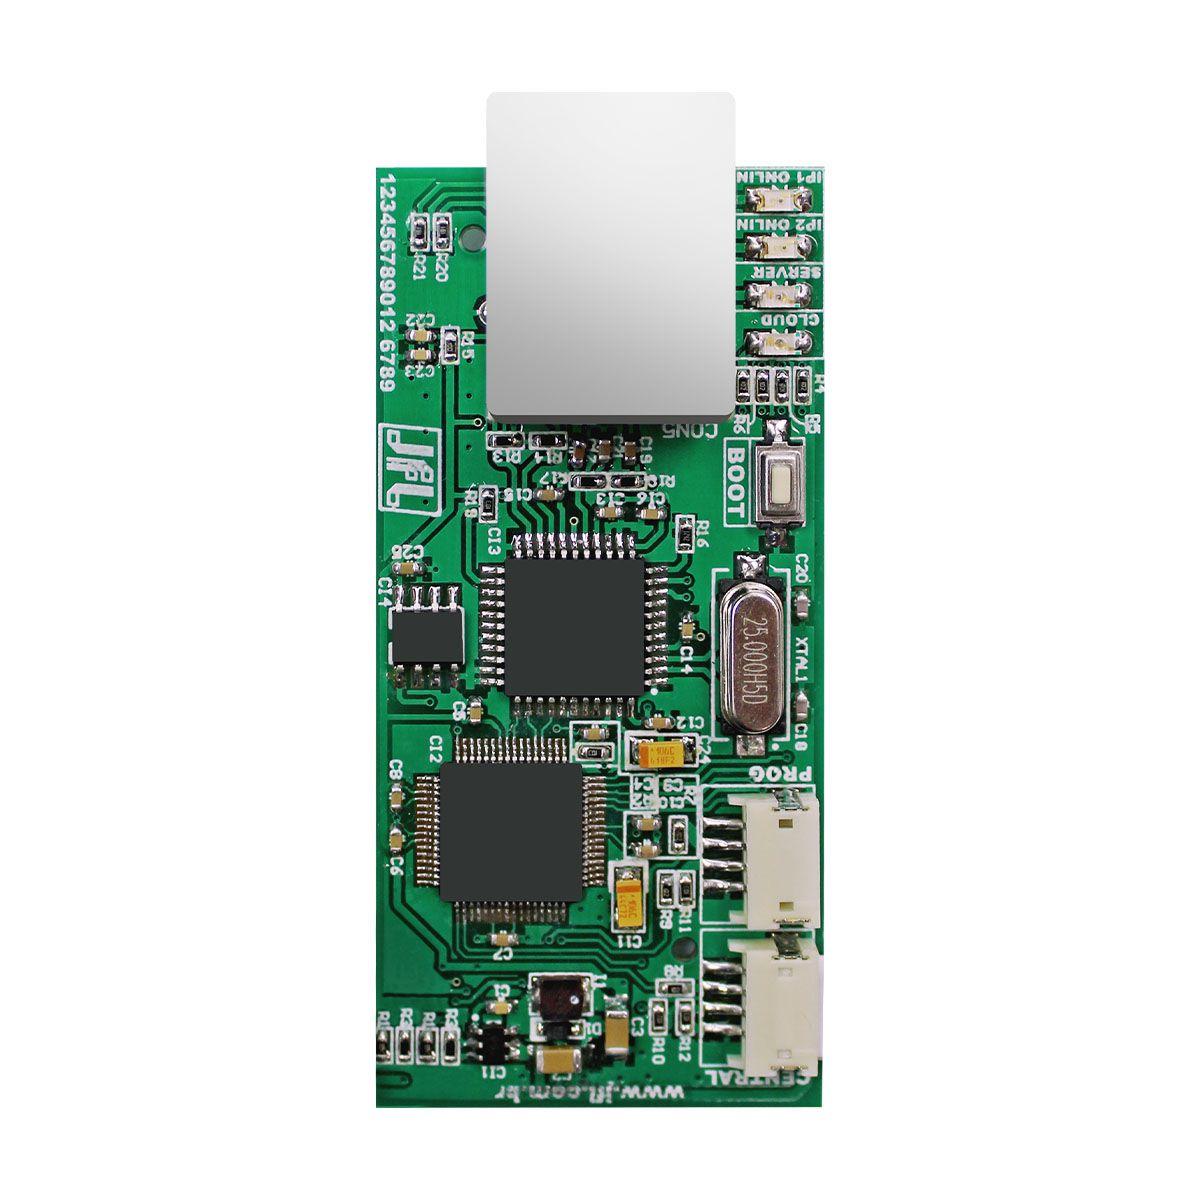 Kit Alarme Active 32 Duo Jfl Sensores Sl 220 e 520 Duo Sem Fio